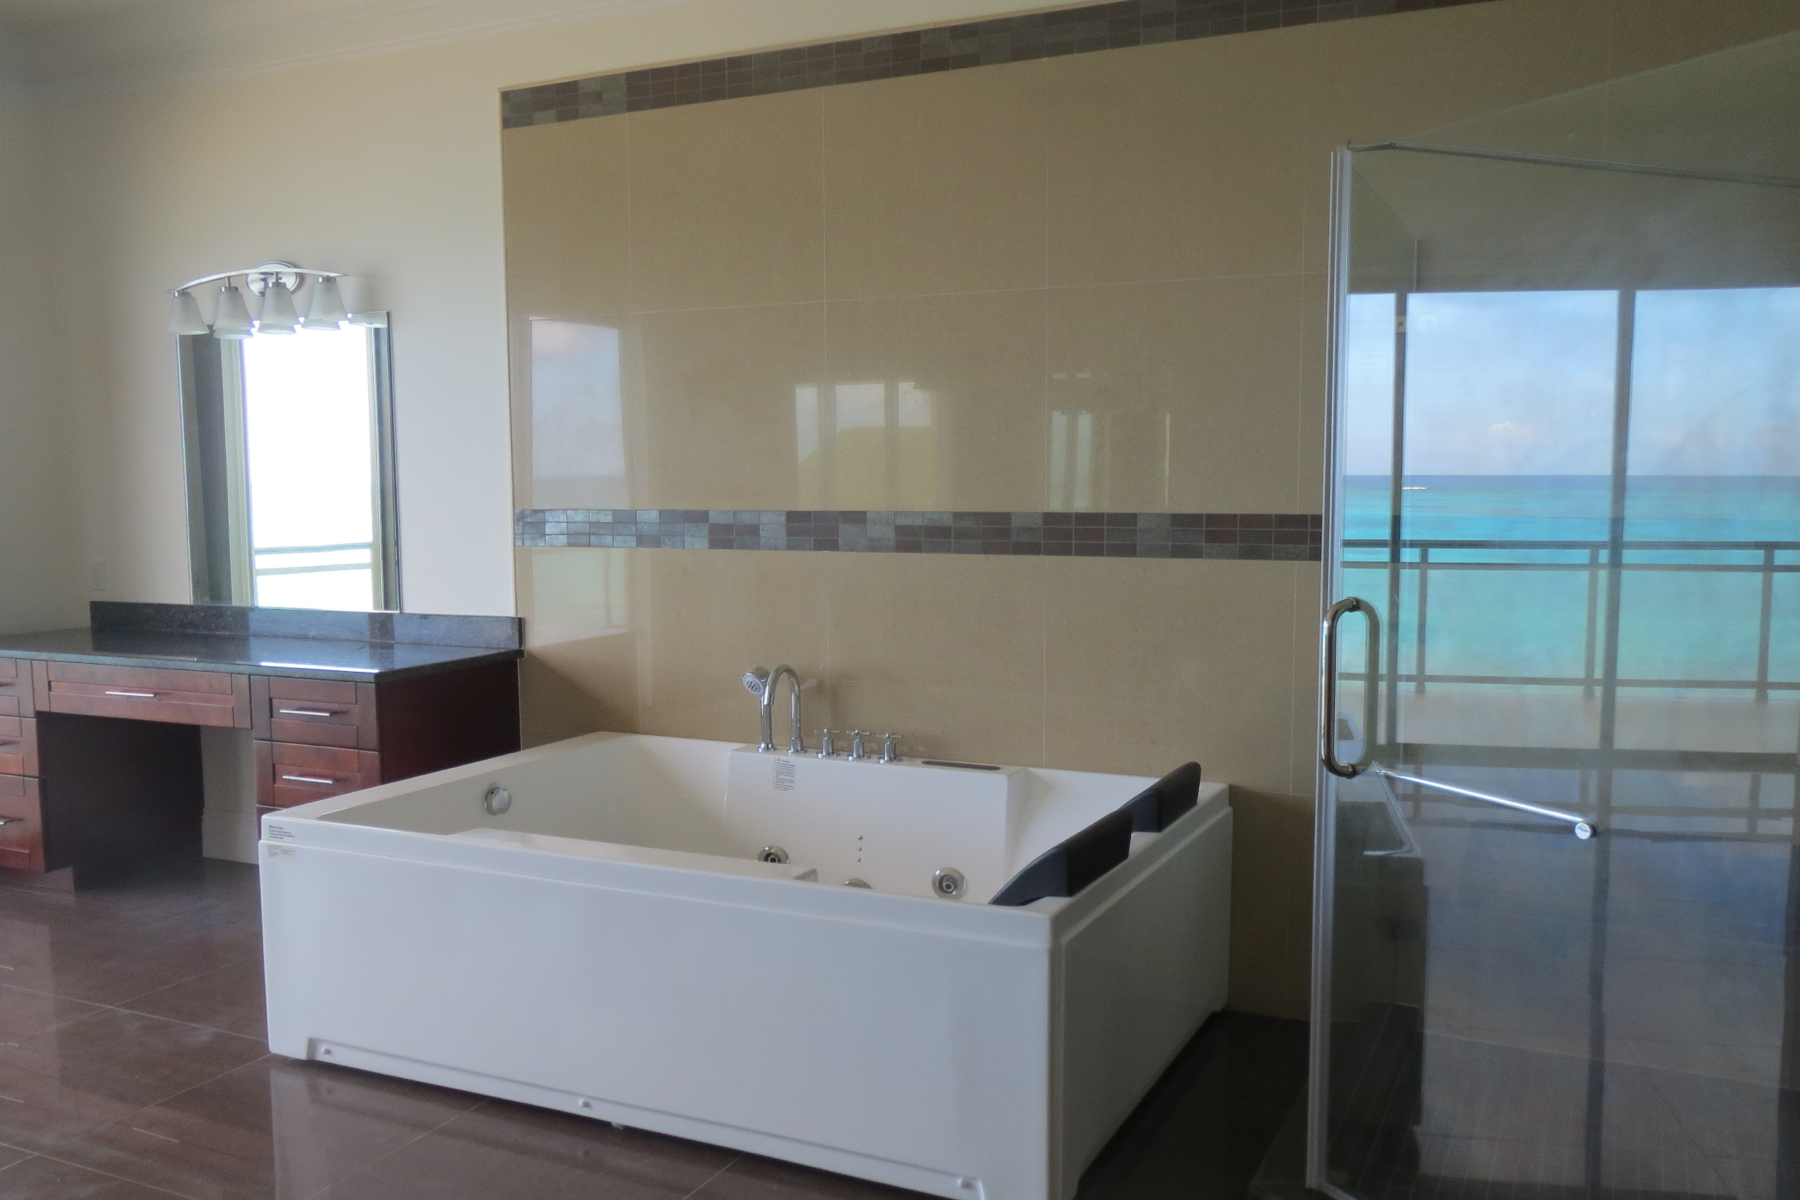 Additional photo for property listing at Columbus Cove Beachfront Townhouse Columbus Cove, Love Beach, Nueva Providencia / Nassau Bahamas